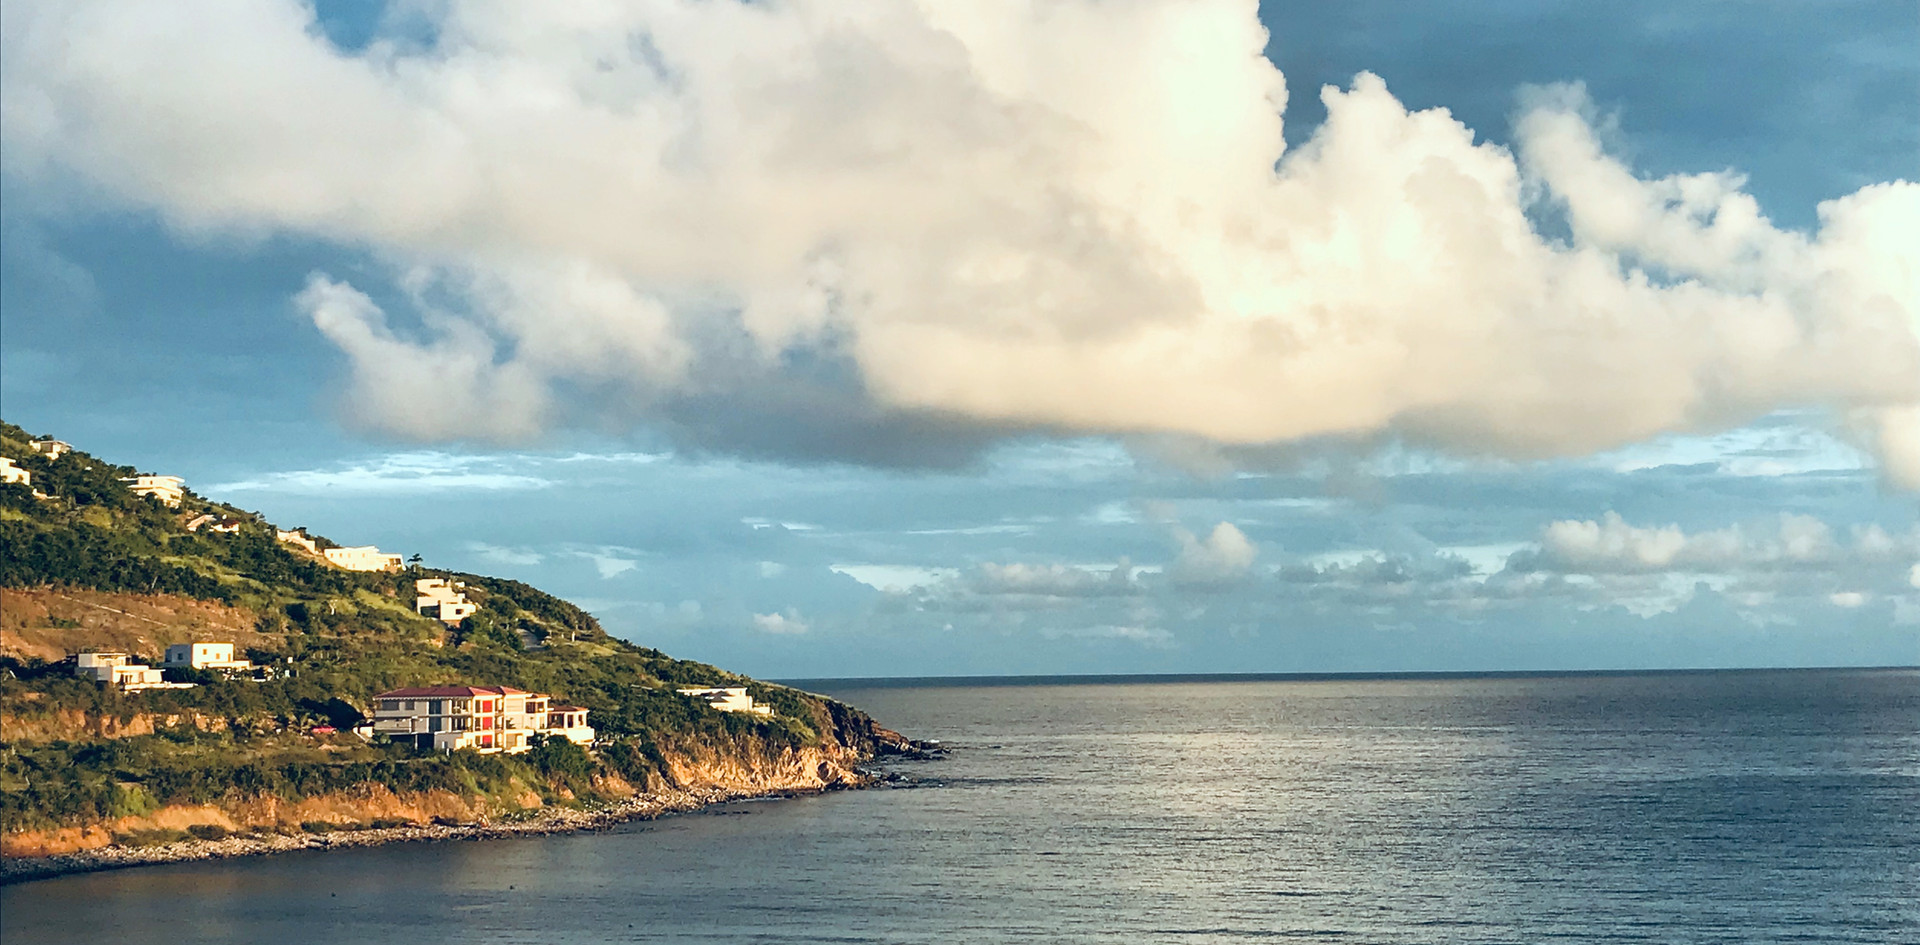 Afternoon view from Villa Amaya